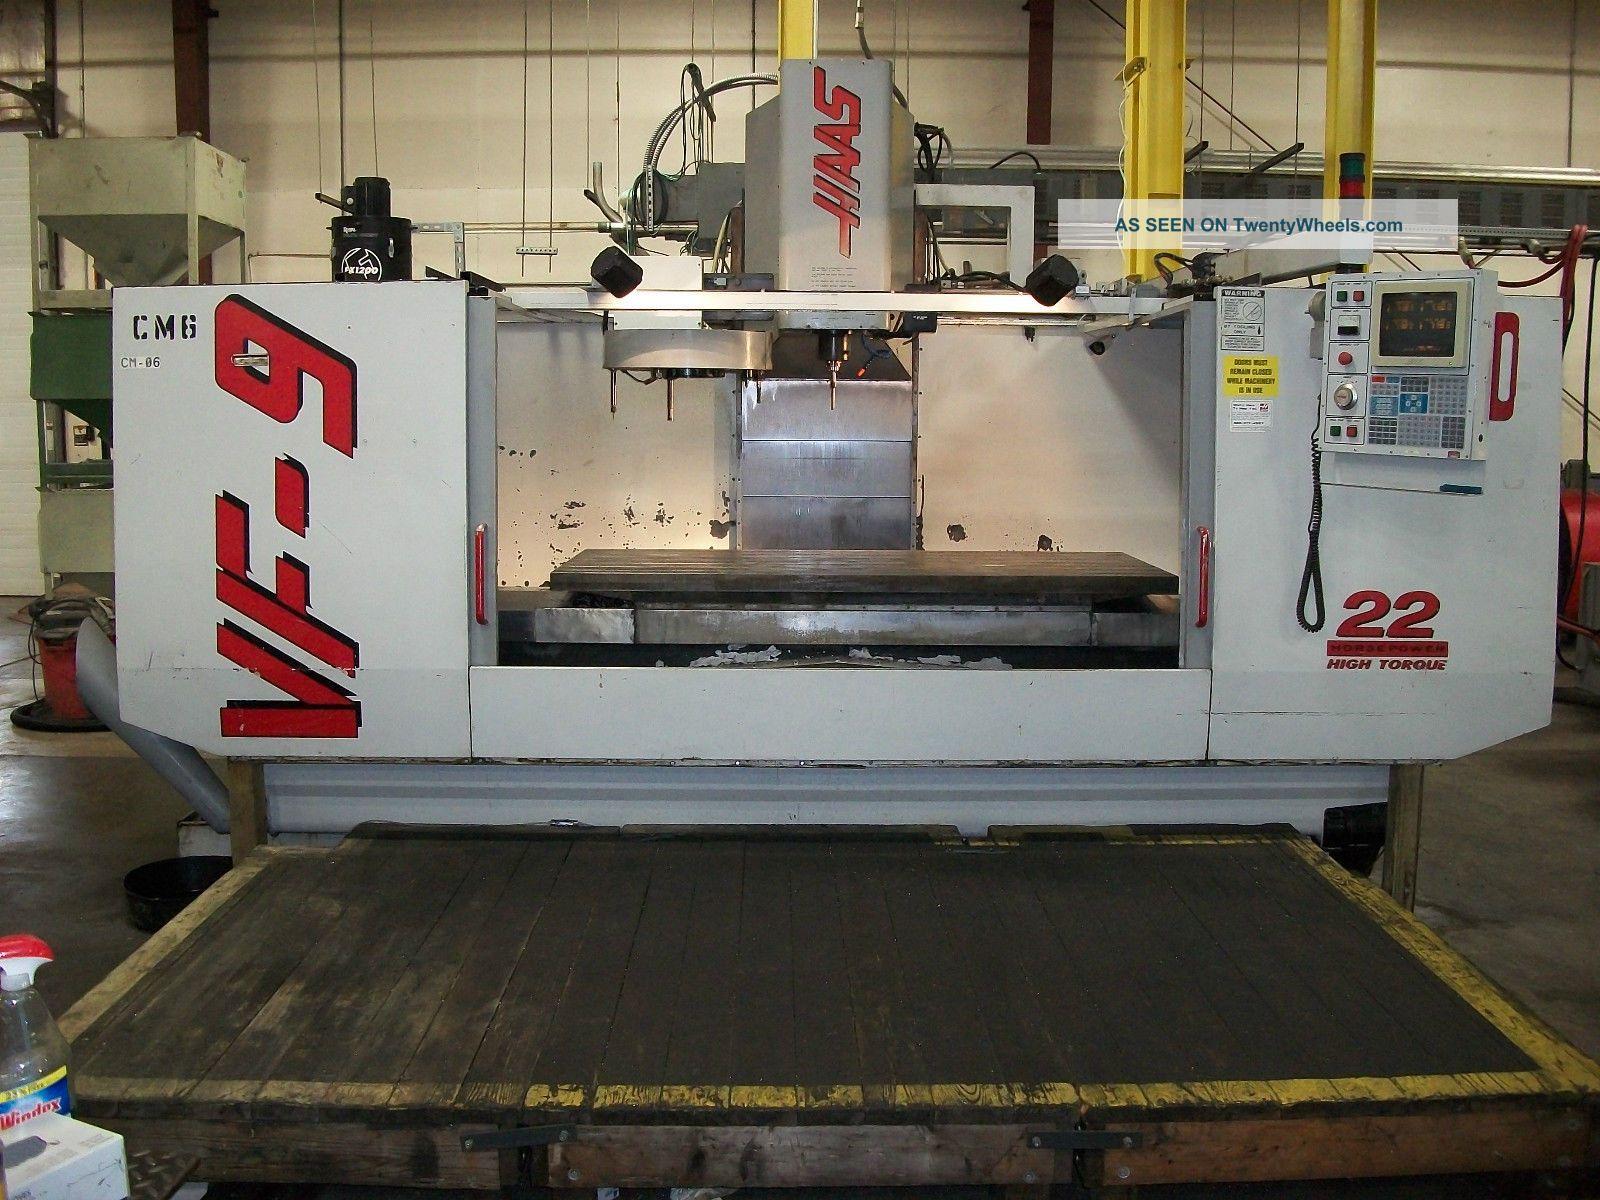 1997 Haas Vf - 9 Cnc Mill Milling Machines photo